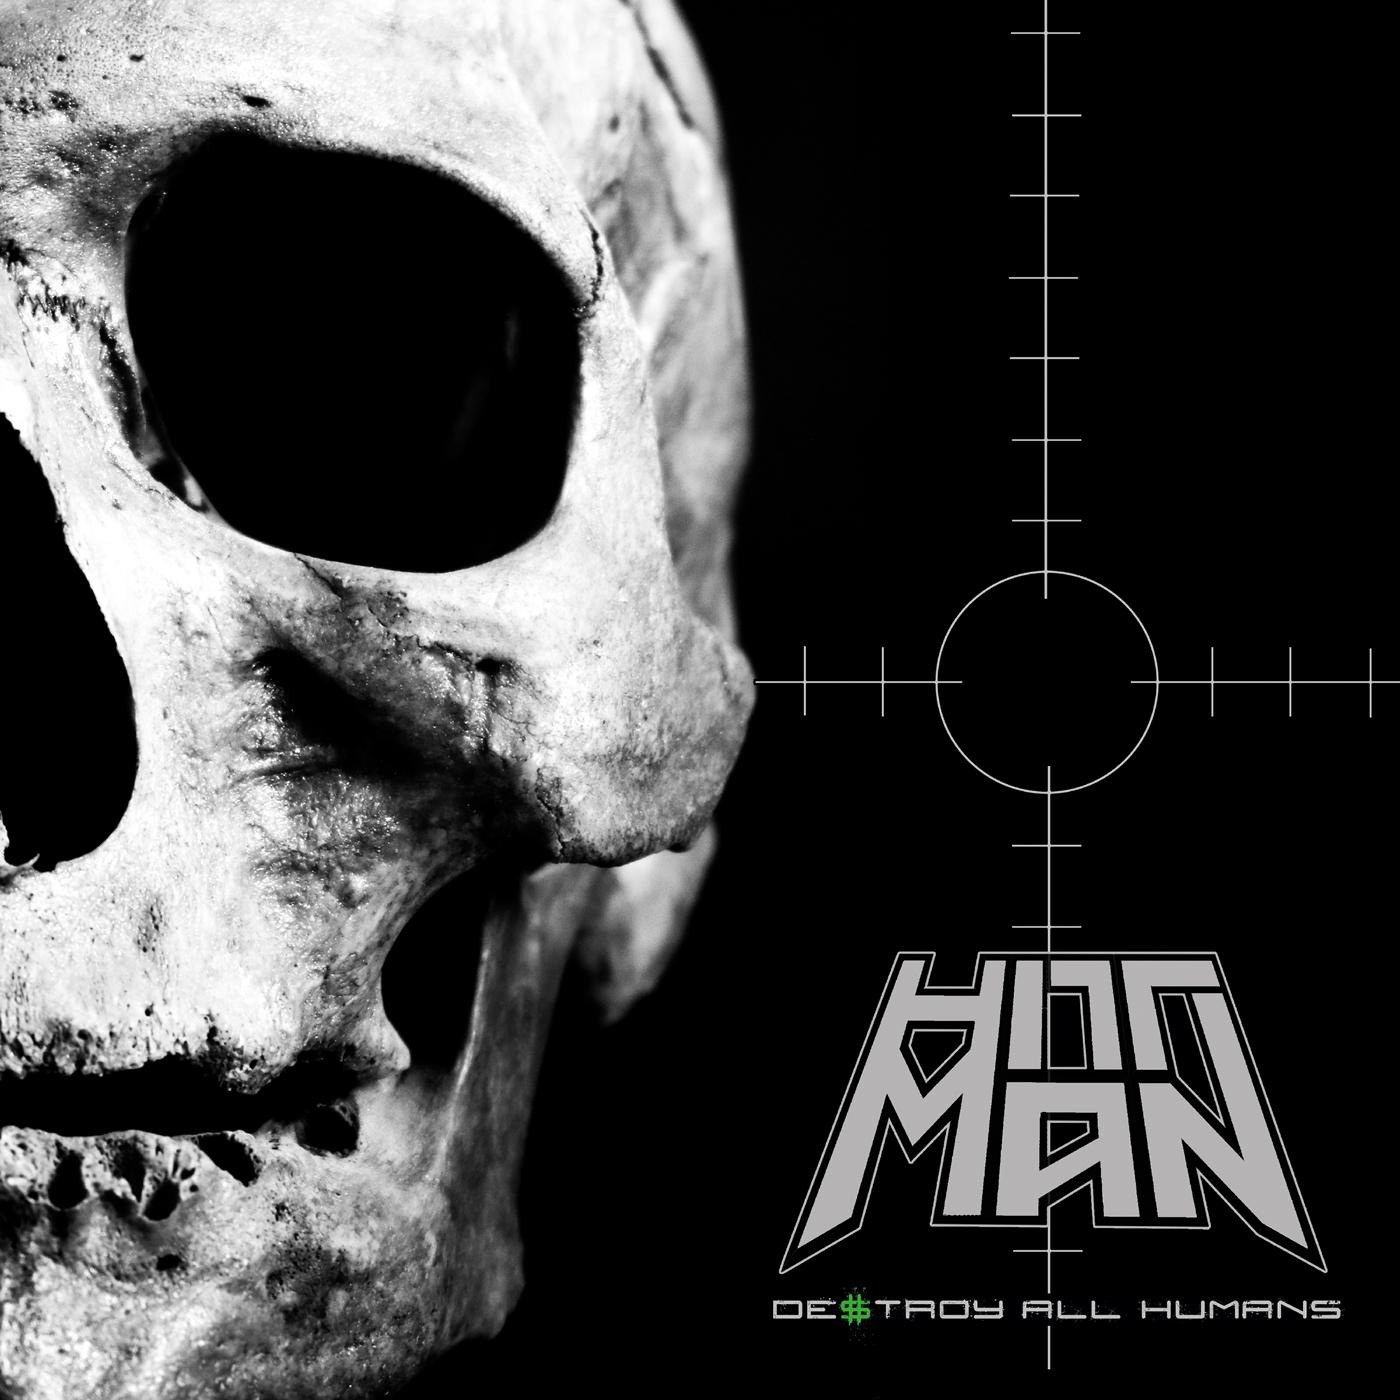 Hittman_Cover